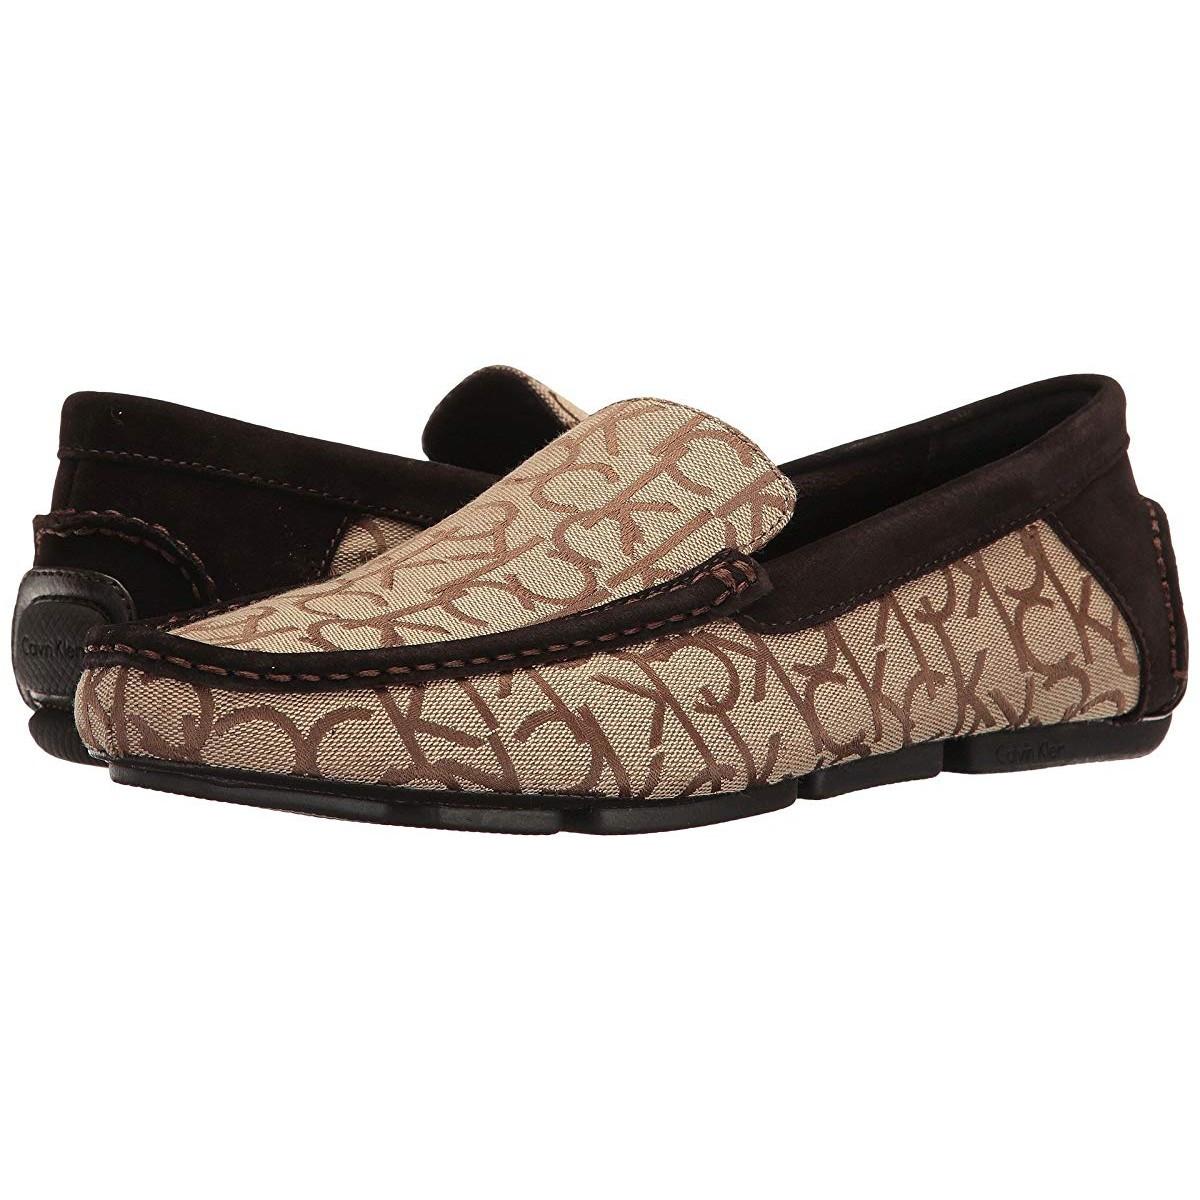 786c4e505359 Calvin Klein - Мужская обувь Объявления в Украине на BESPLATKA.ua